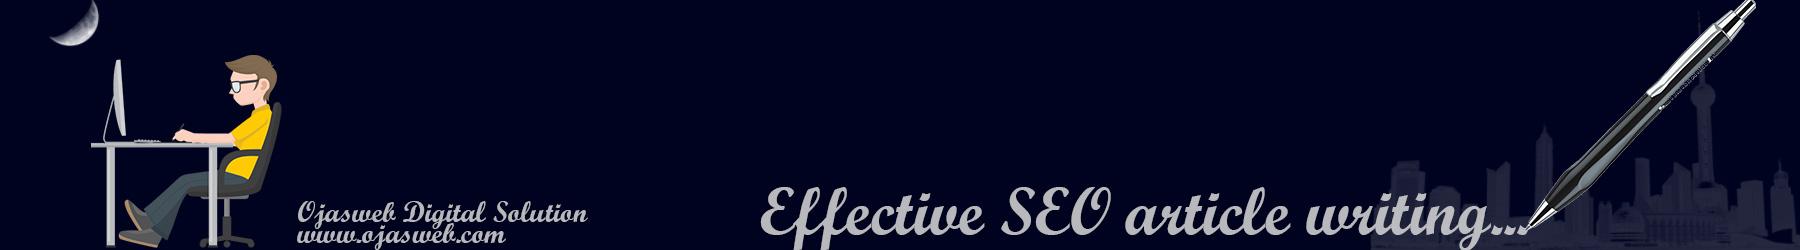 effective-seo-article-writing